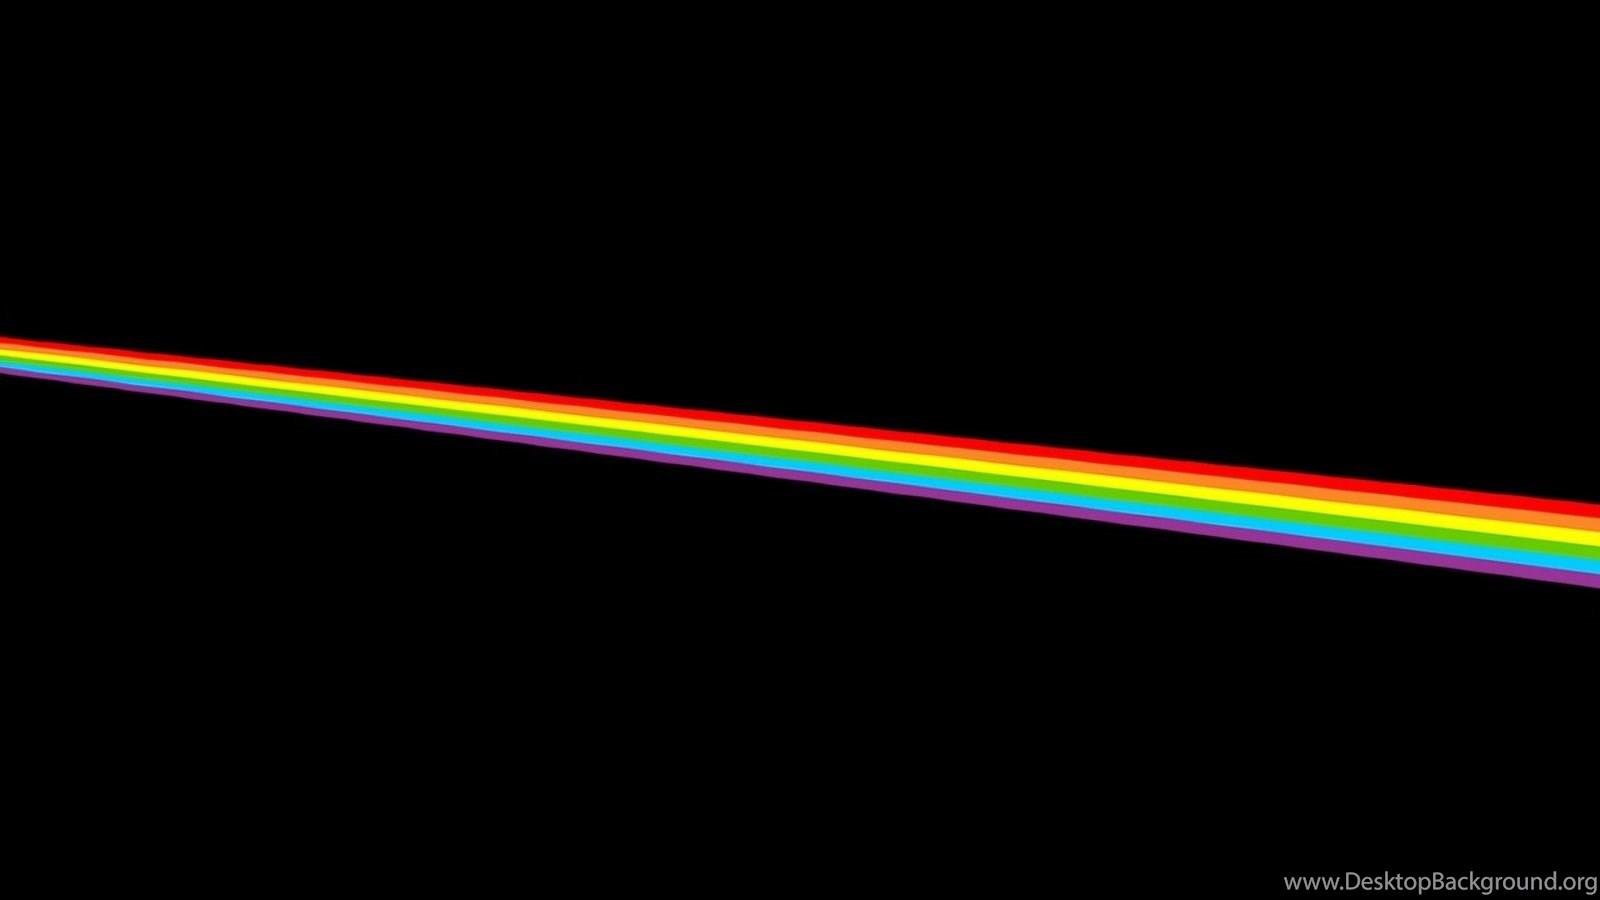 Download Wallpapers Pink Floyd Dark Side Of The Moon Pink